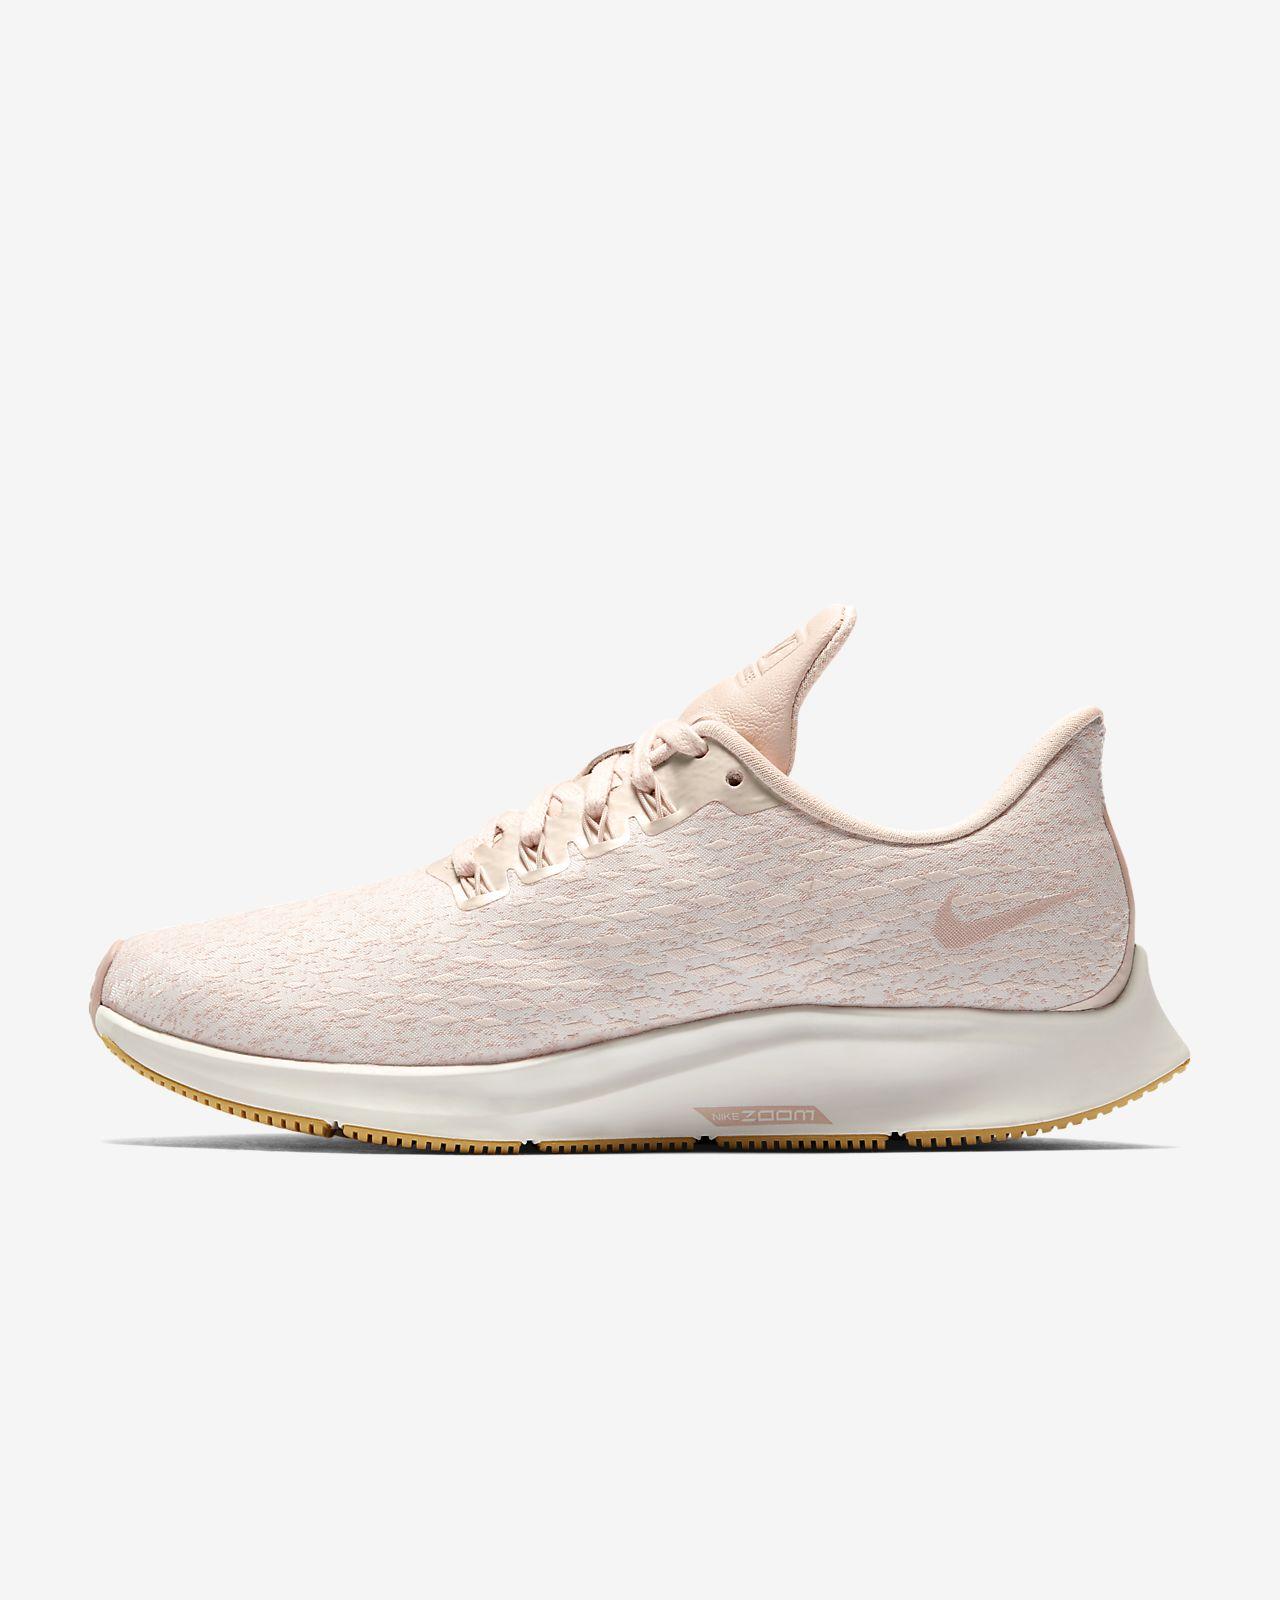 Calzado de running para mujer Nike Air Zoom Pegasus 35 FlyEase